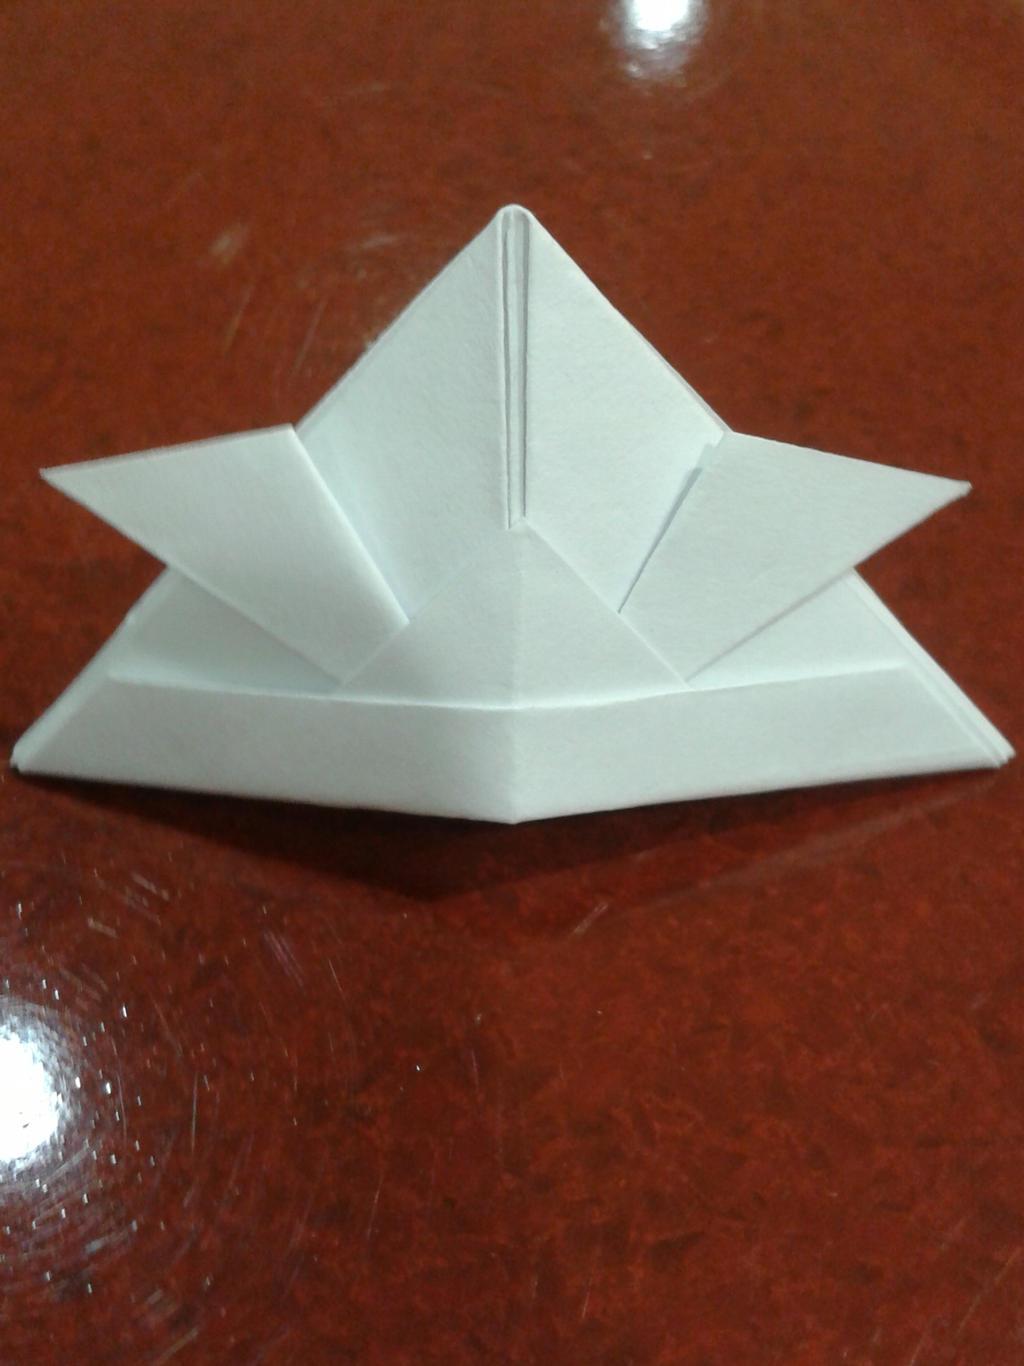 Helmet Base: How To Make An Origami Samurai Helmet | Origami 101 ... | 1366x1024